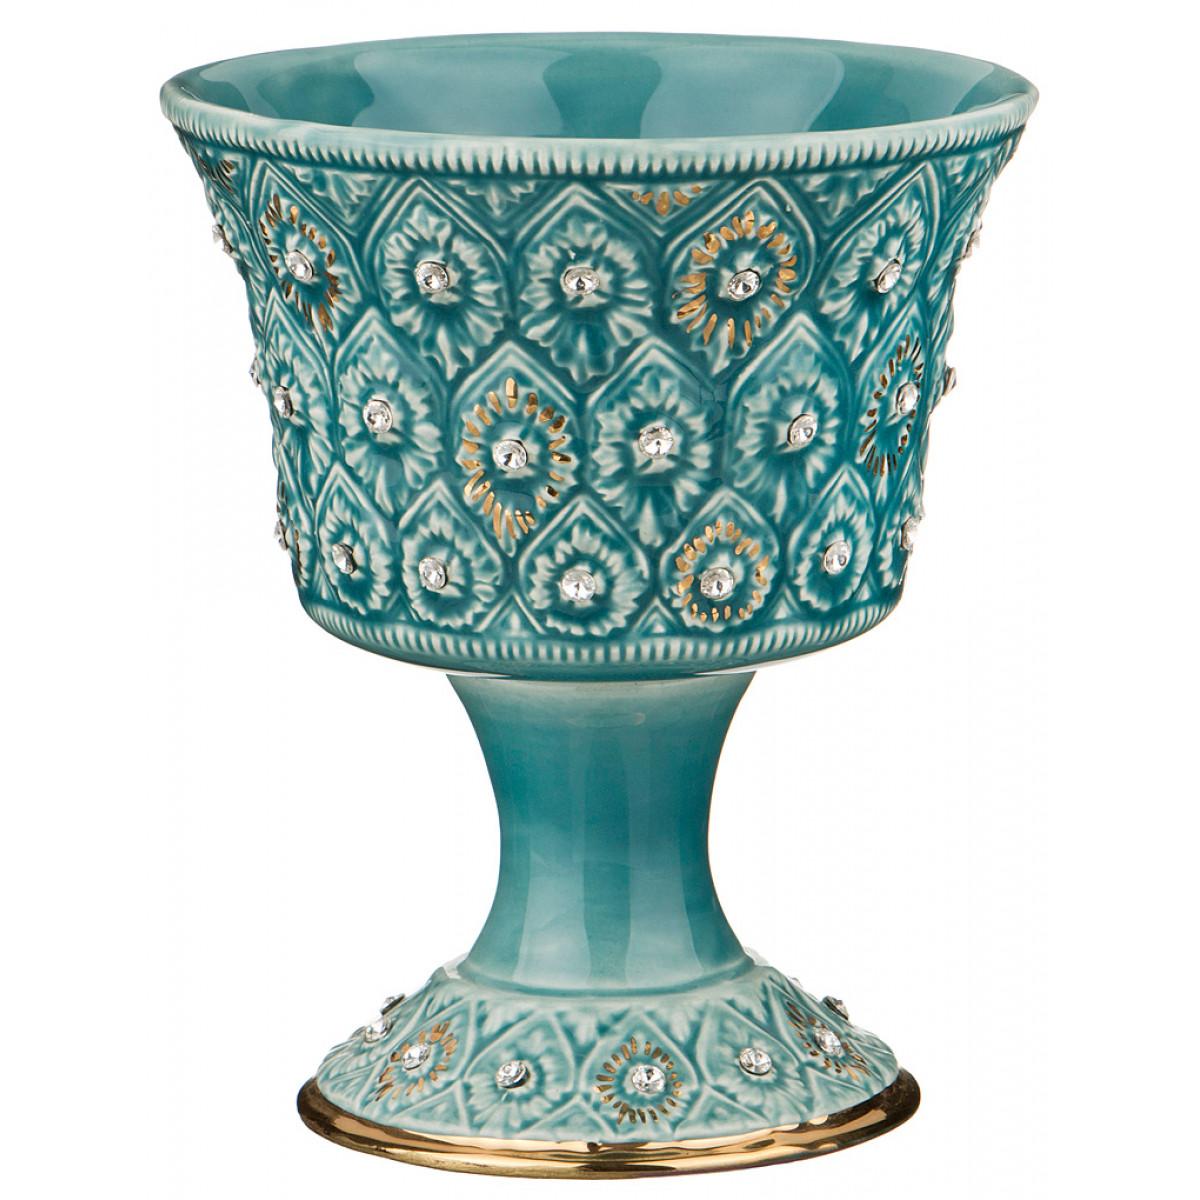 {} Stella Ваза Keshawn  (15х18 см) ваза керамика розовый рассвет 18 12 8 5 см 863622